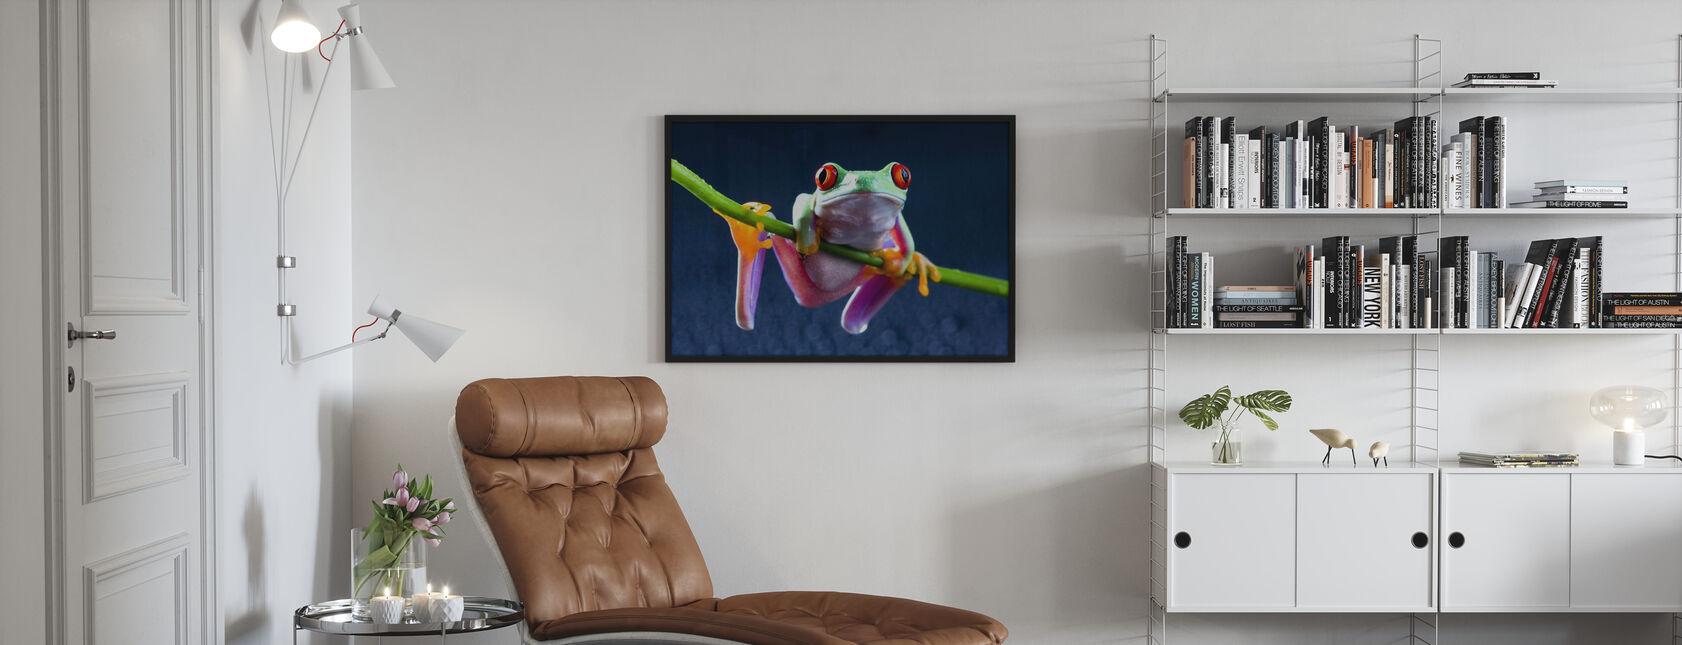 Rana rossa - Poster - Salotto